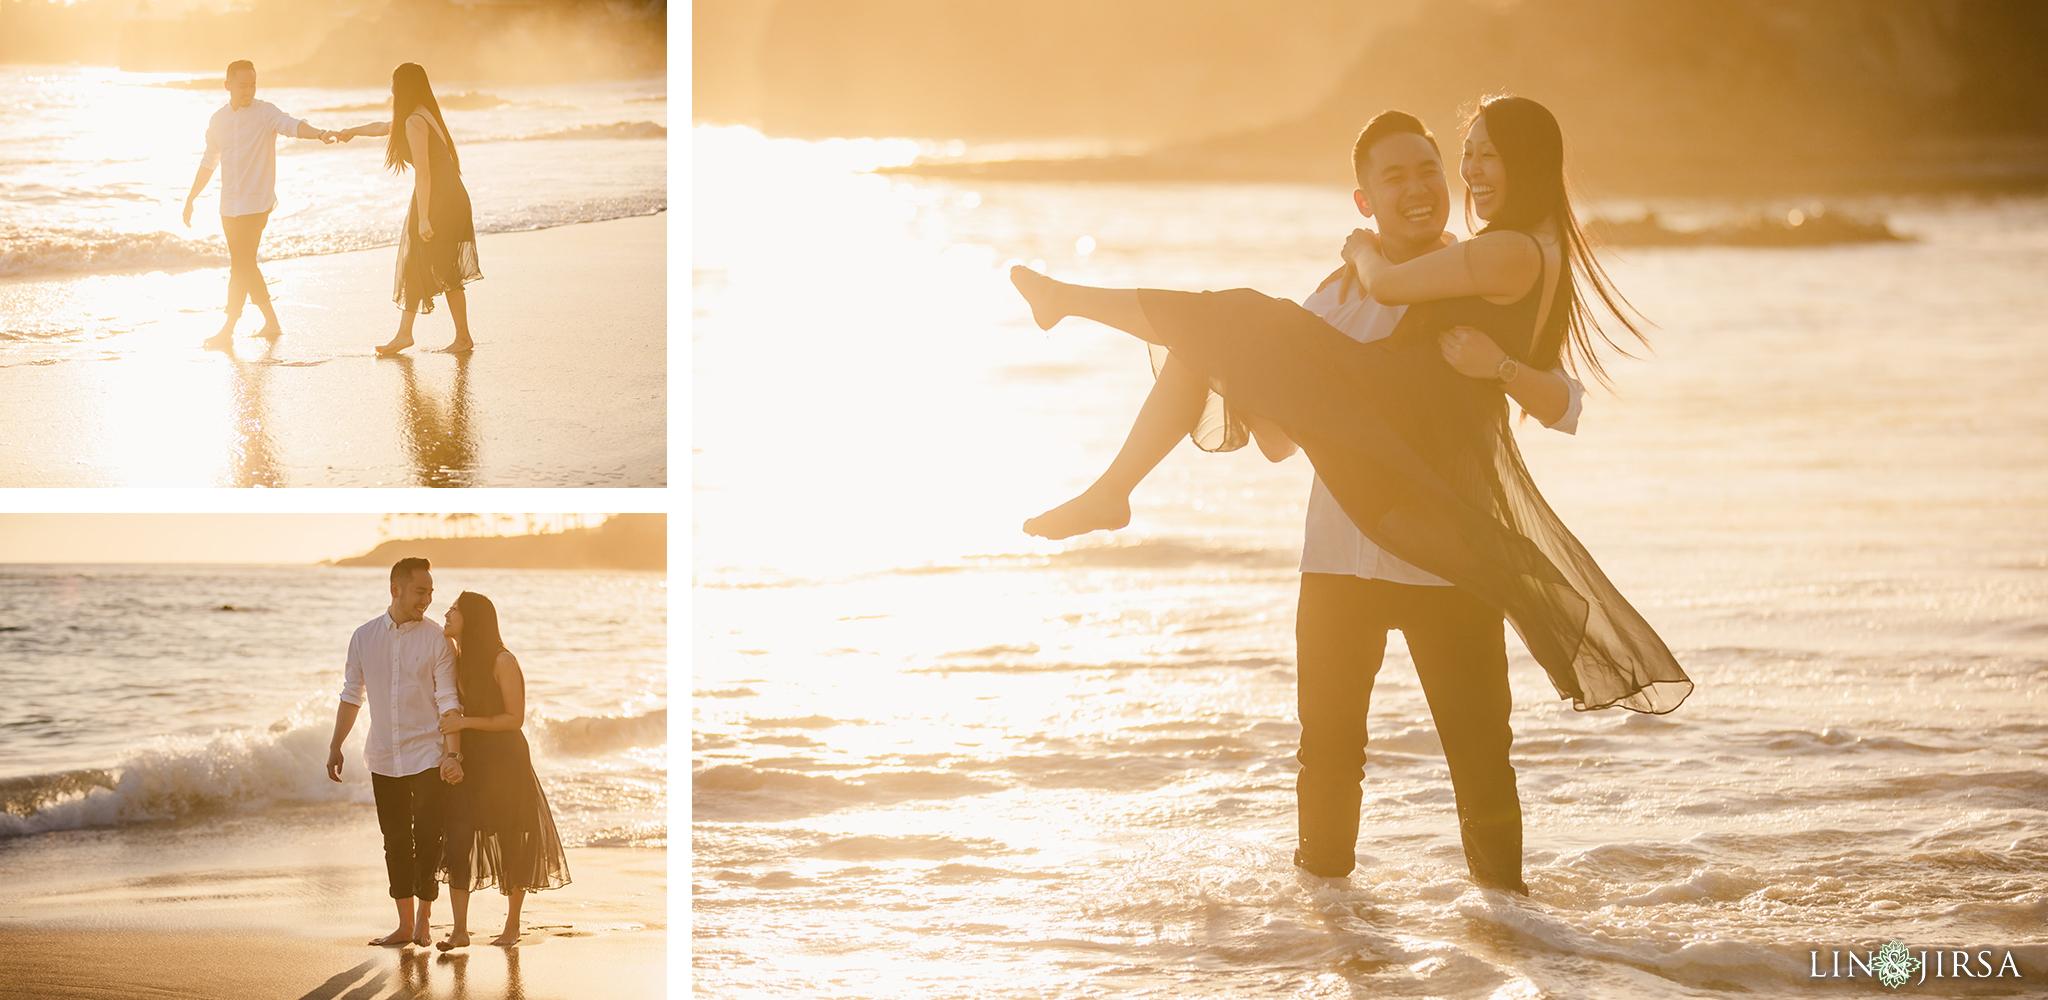 06 Heisler Beach Orange County Proposal Engagement Photography